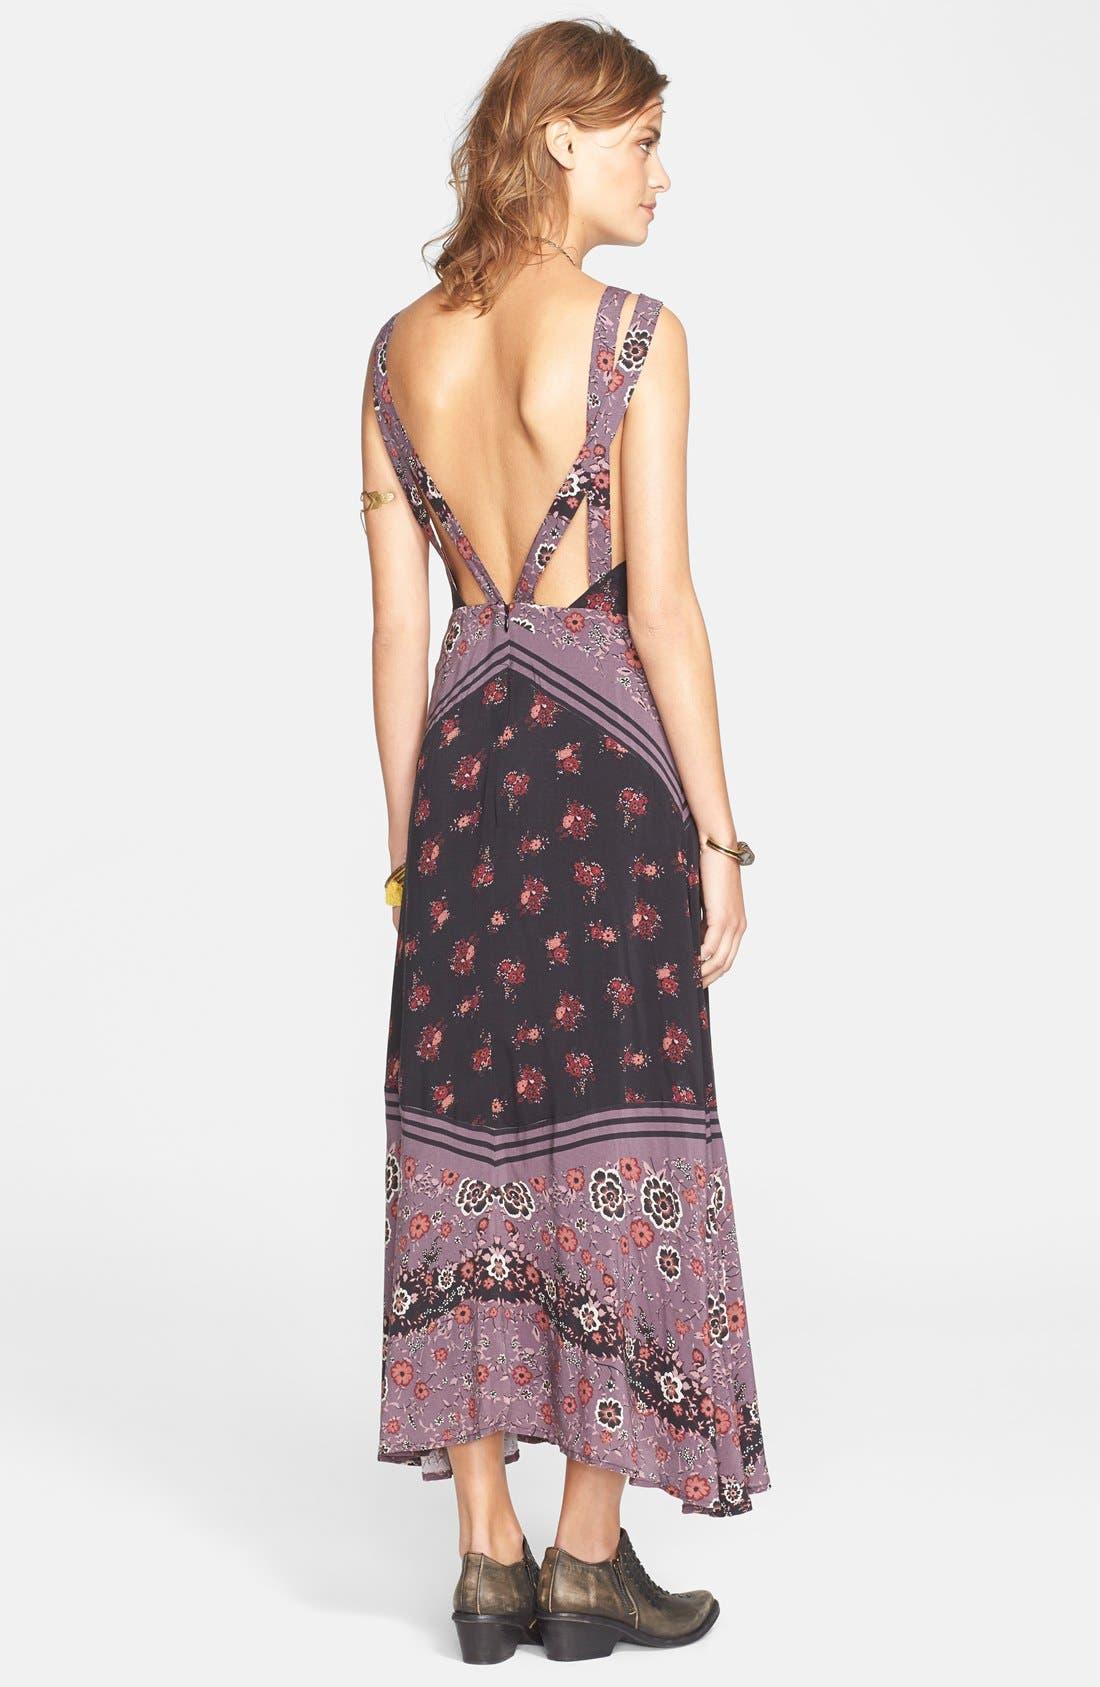 FREE PEOPLE,                             'Sunrise Oblivion' Floral Print Dress,                             Alternate thumbnail 2, color,                             001